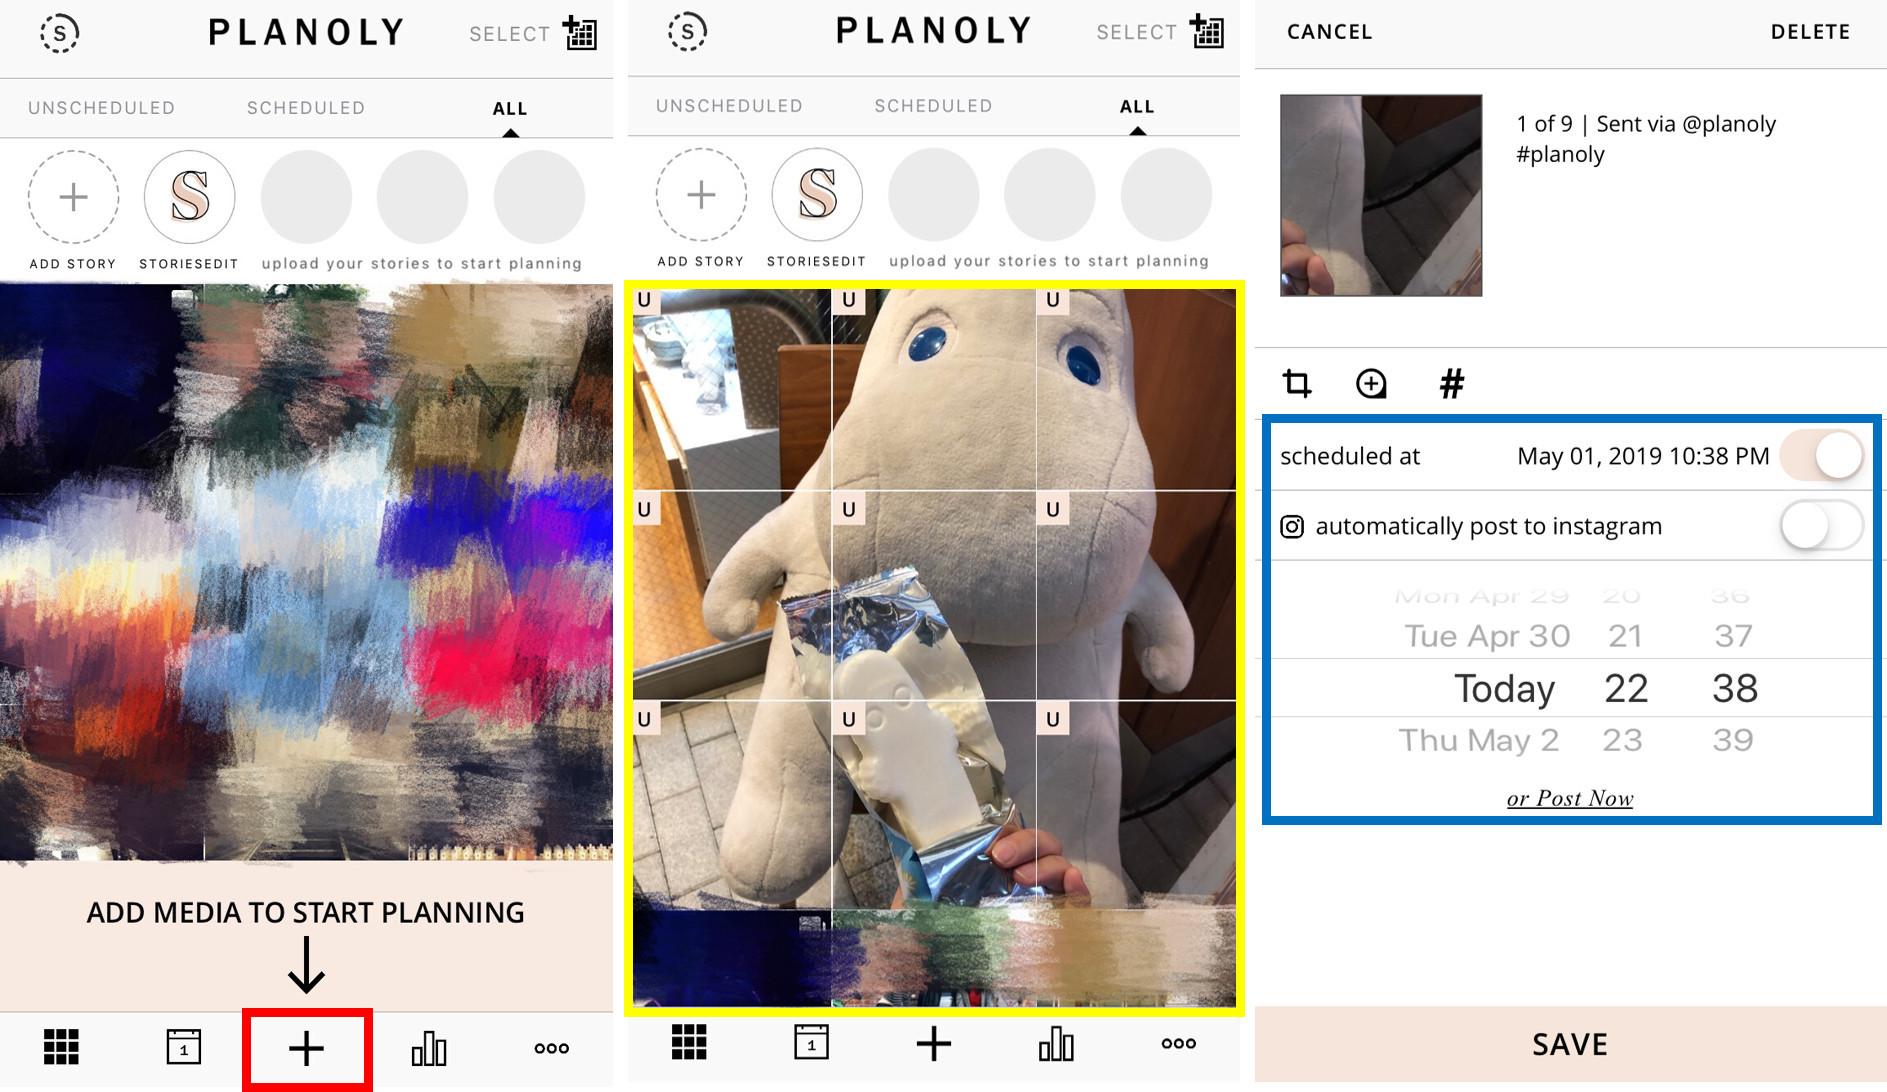 Planoly編輯頁面-鯊客科技SEO網頁設計公司